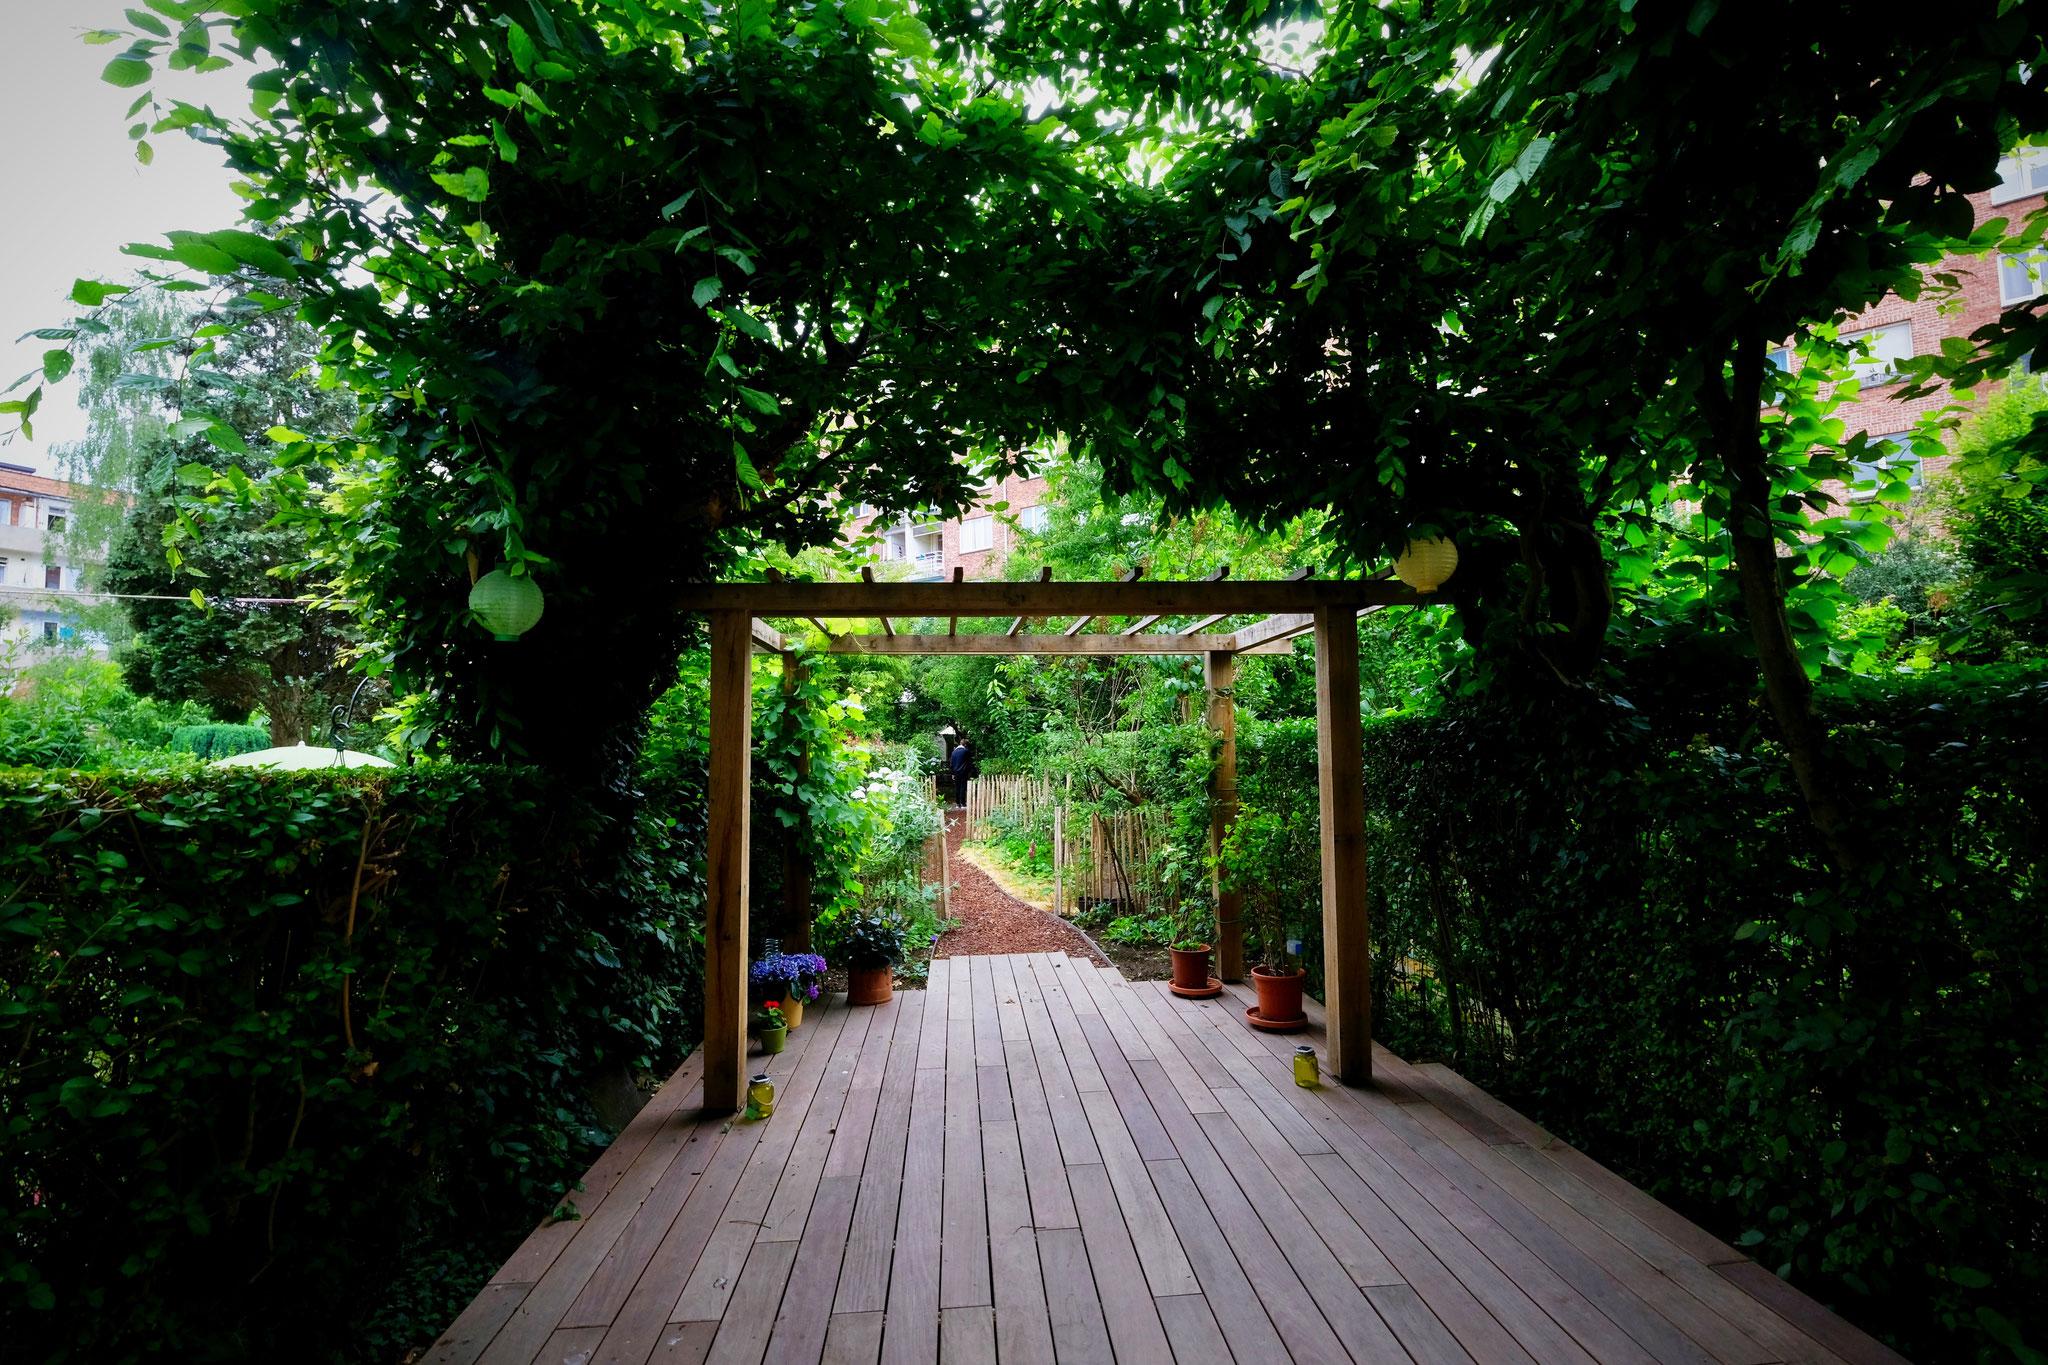 Jardin de ville 120m2 - Agroforesterie urbaine - La terrasse principale. Aménagement jardin Bruxelles.